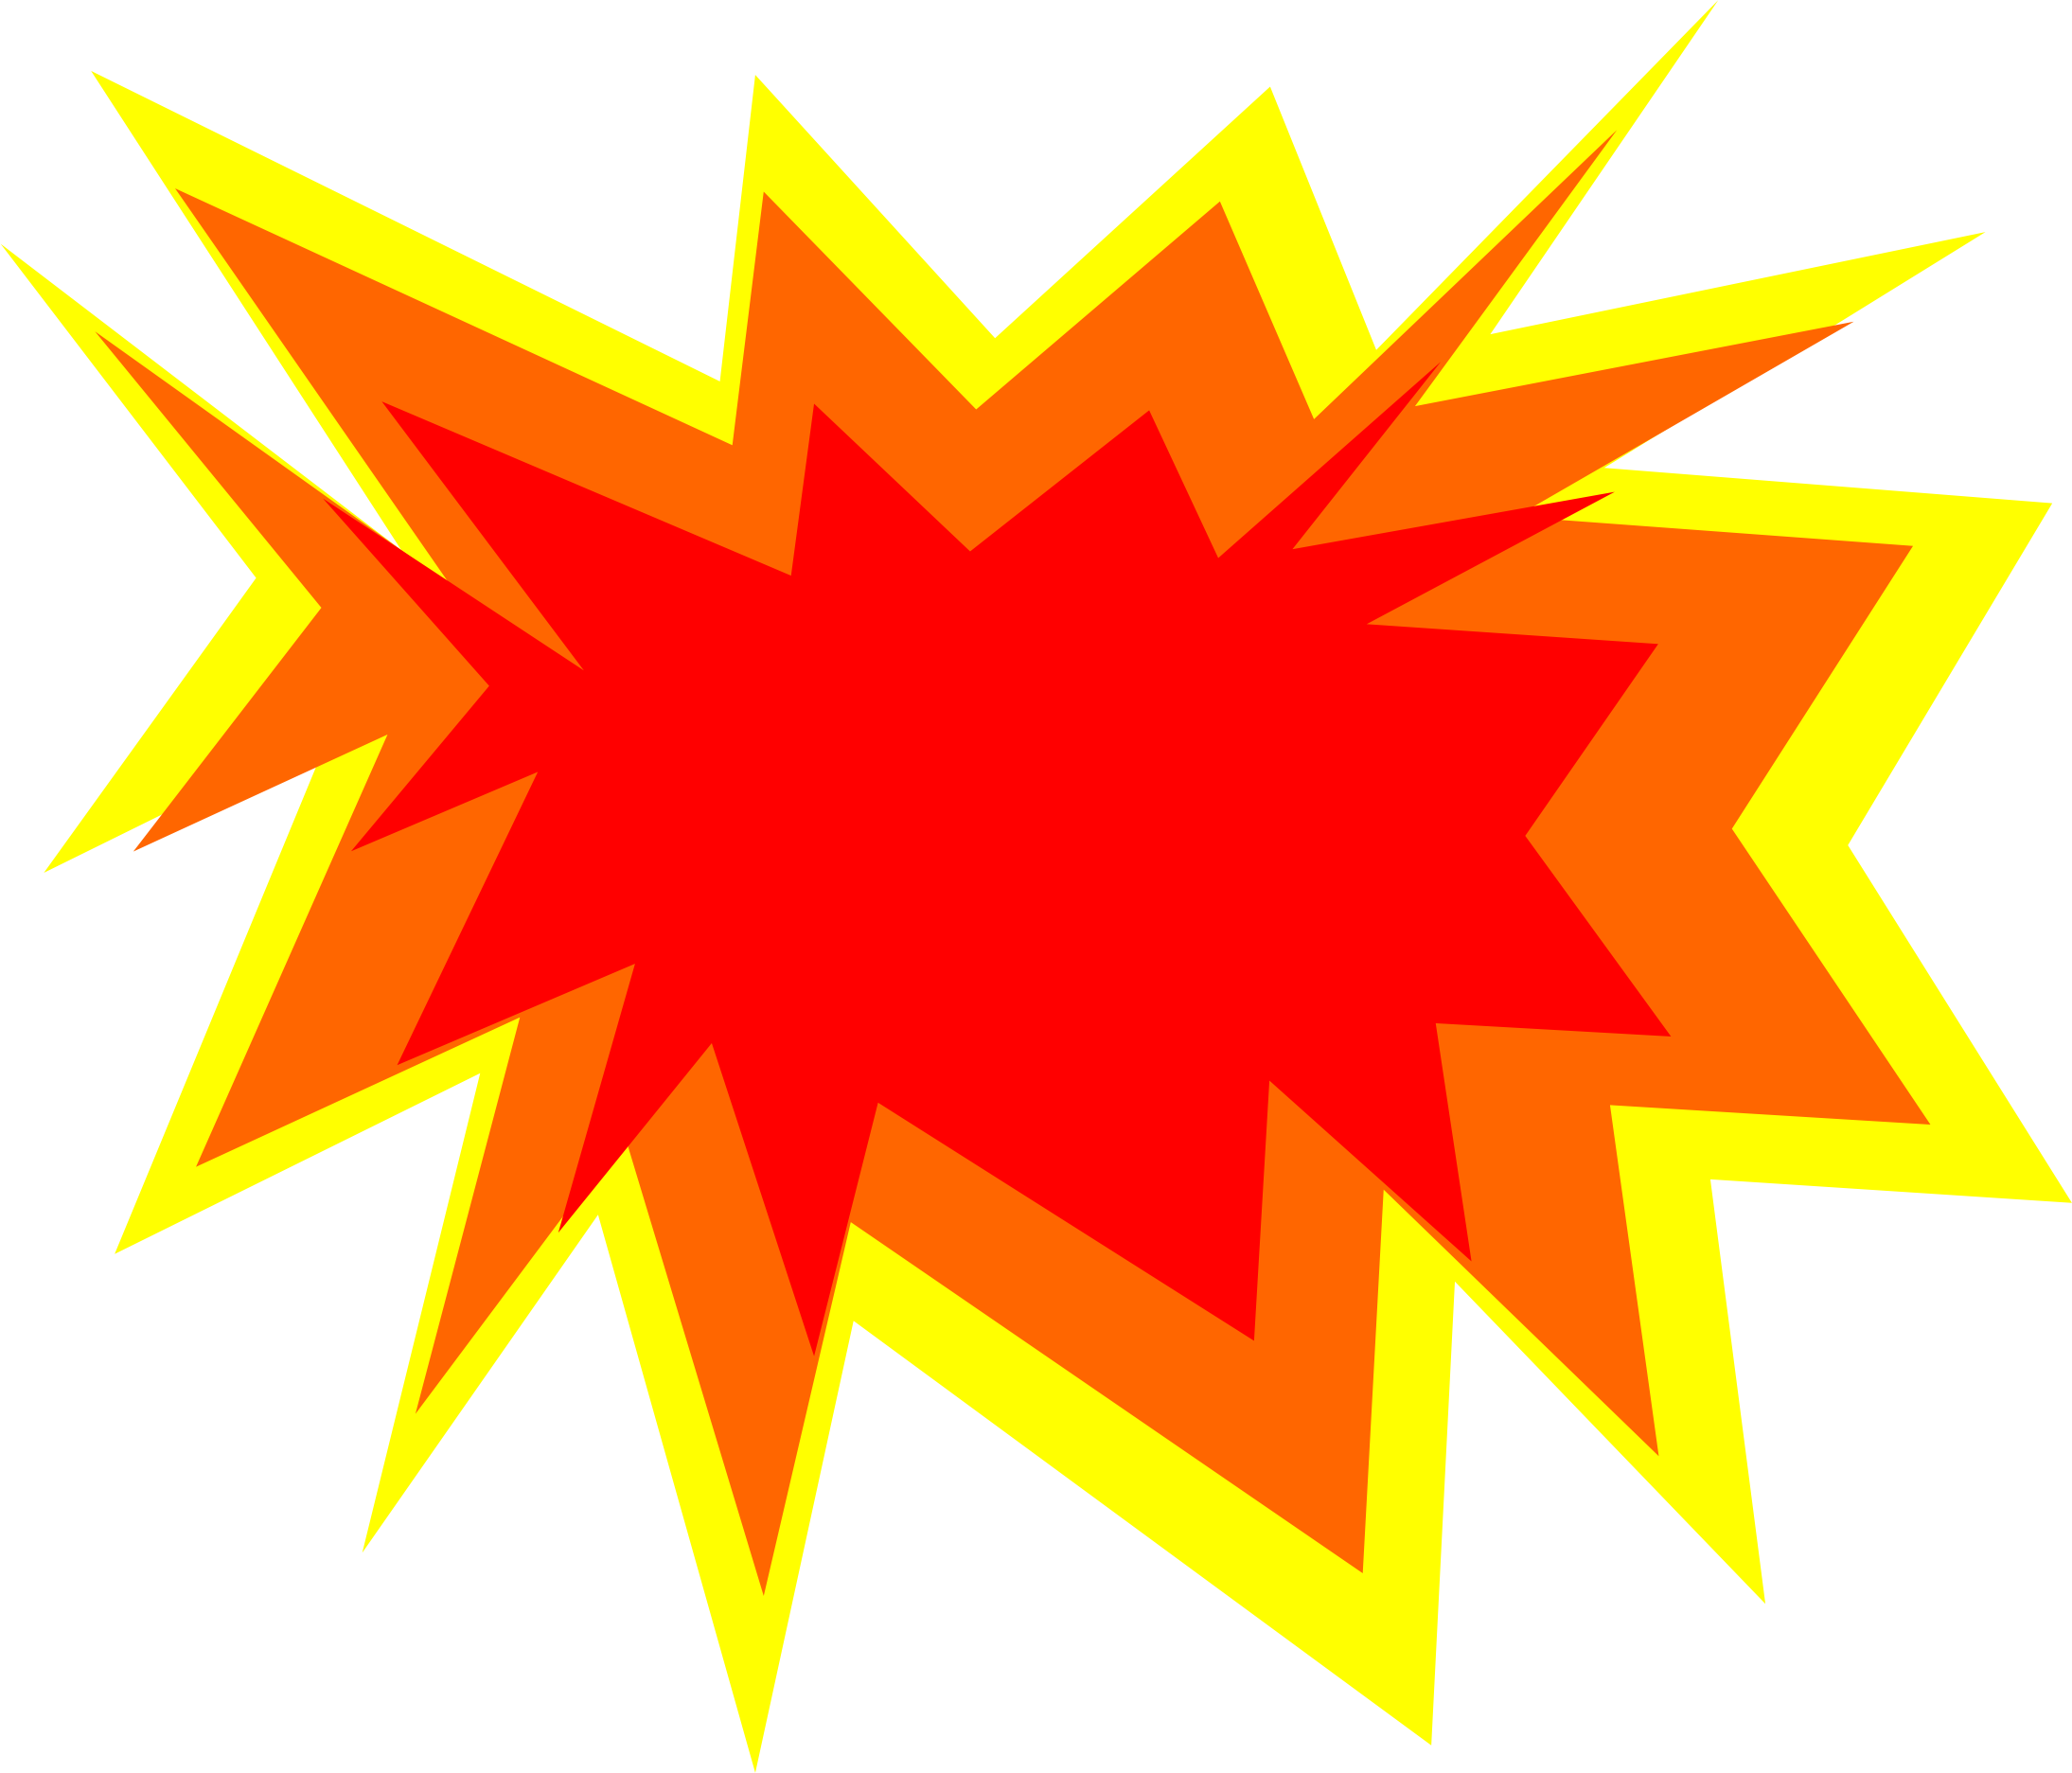 Explosion Clip-Explosion Clip-15